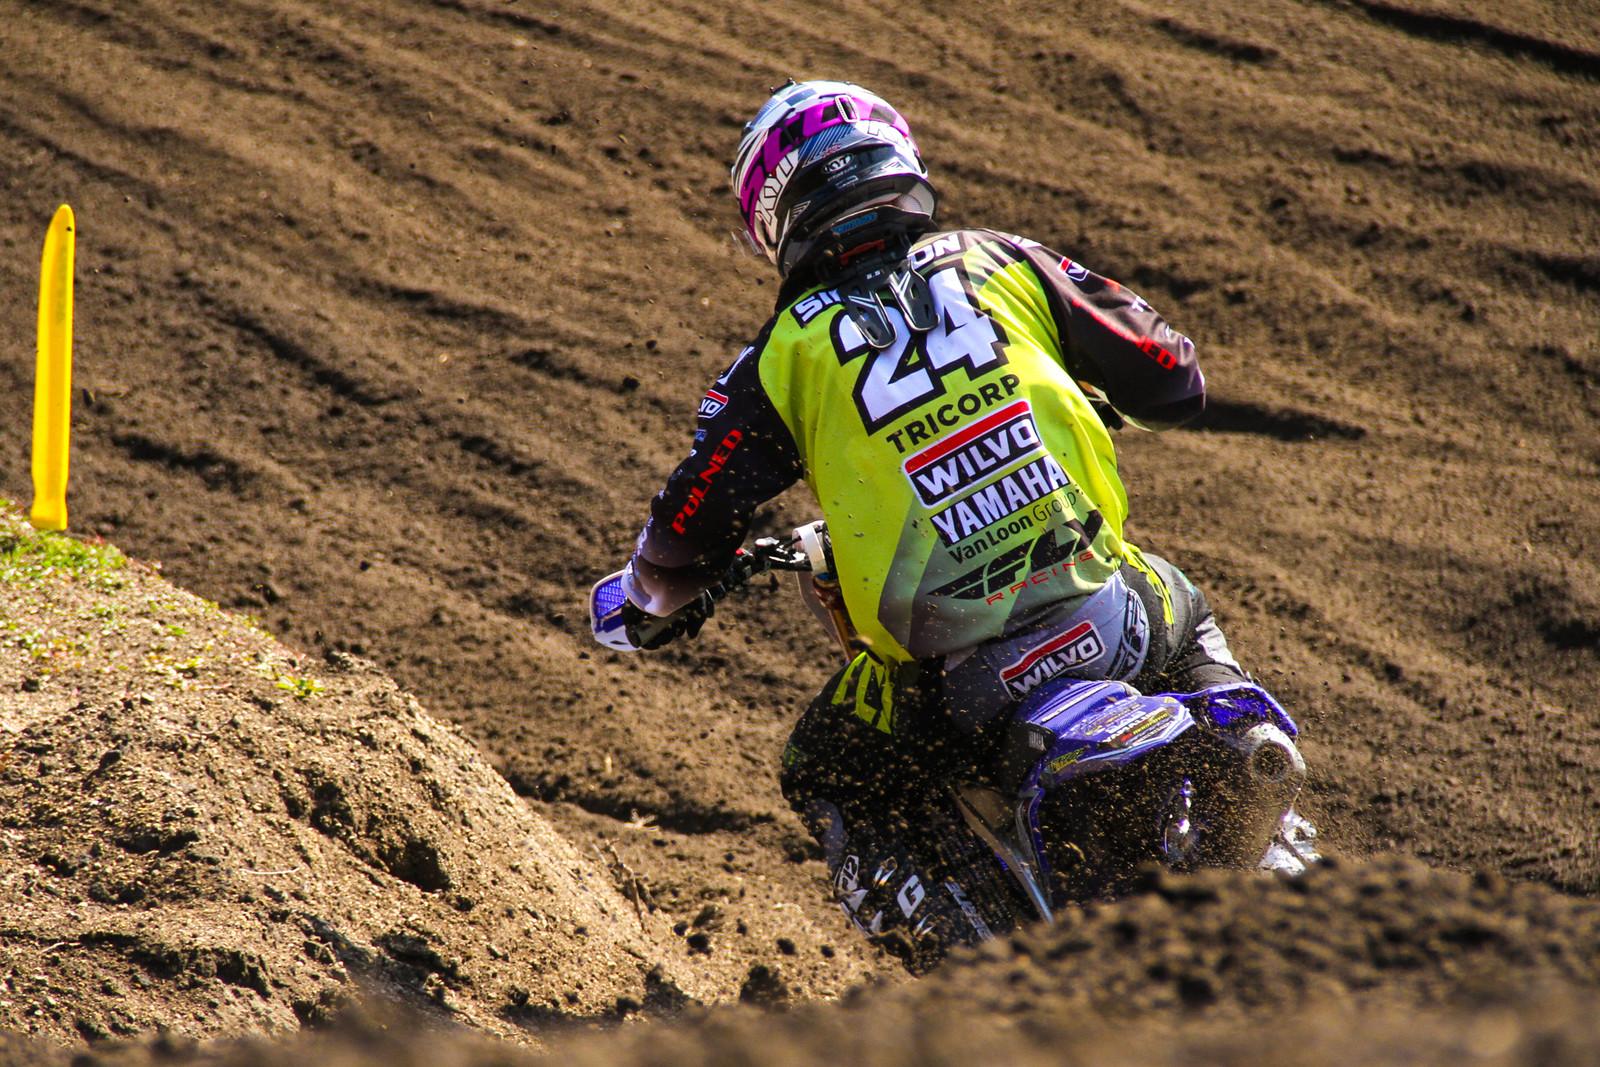 Shaun Simpson - Photo Blast: 2017 MXGP of Argentina - Motocross Pictures - Vital MX